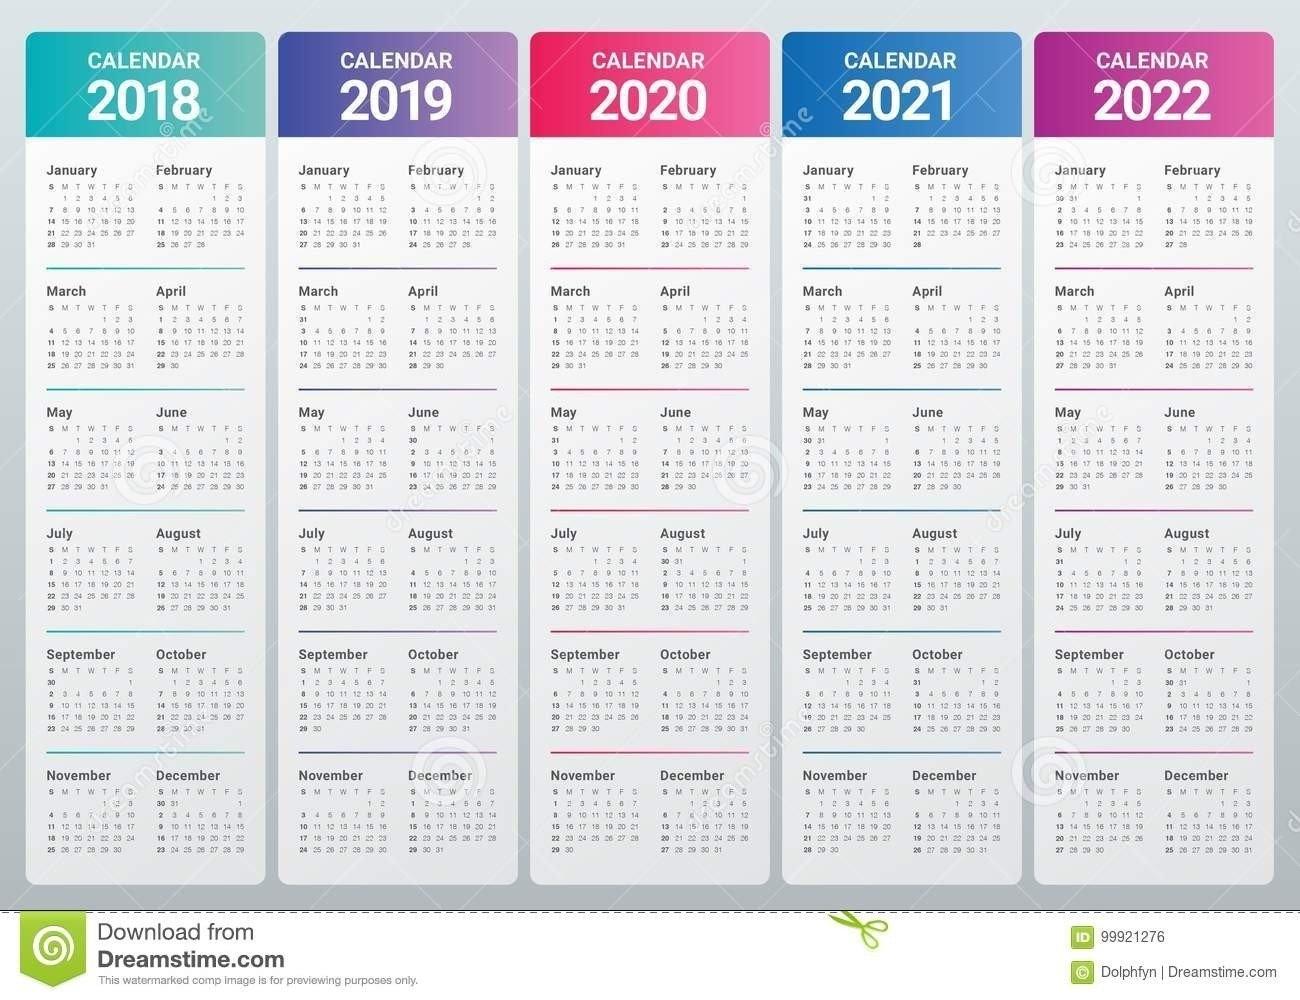 3 Year Calendar 2021 | Calendar Template Printable with 3 Year Printable Calendar 2021 2021 2022 Graphics